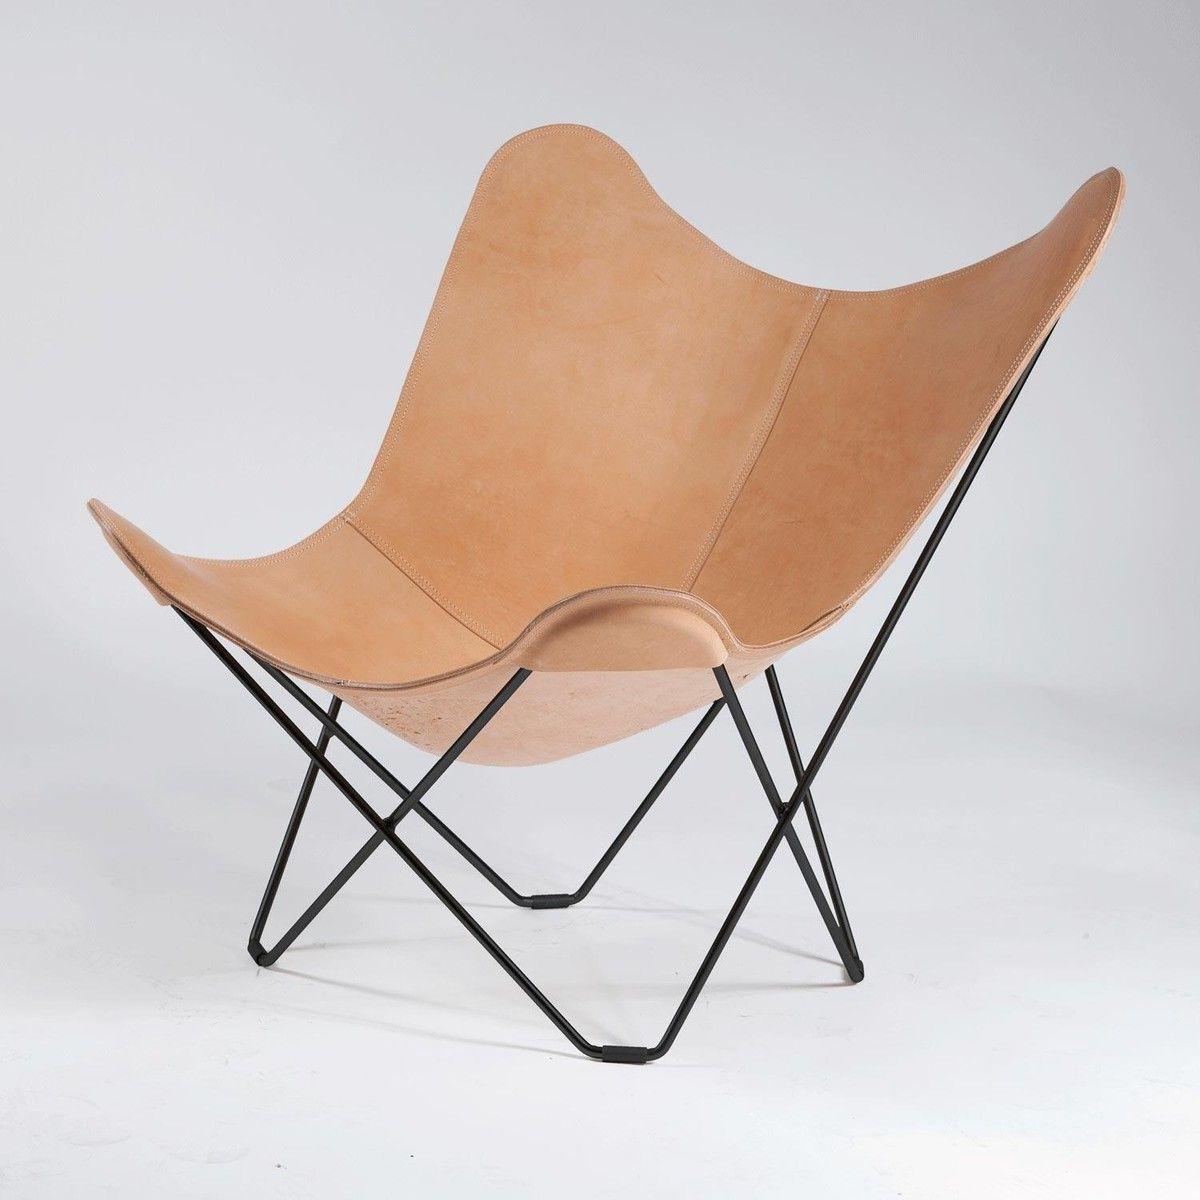 Cuero   Pampa Mariposa Butterfly Chair Amazing Design